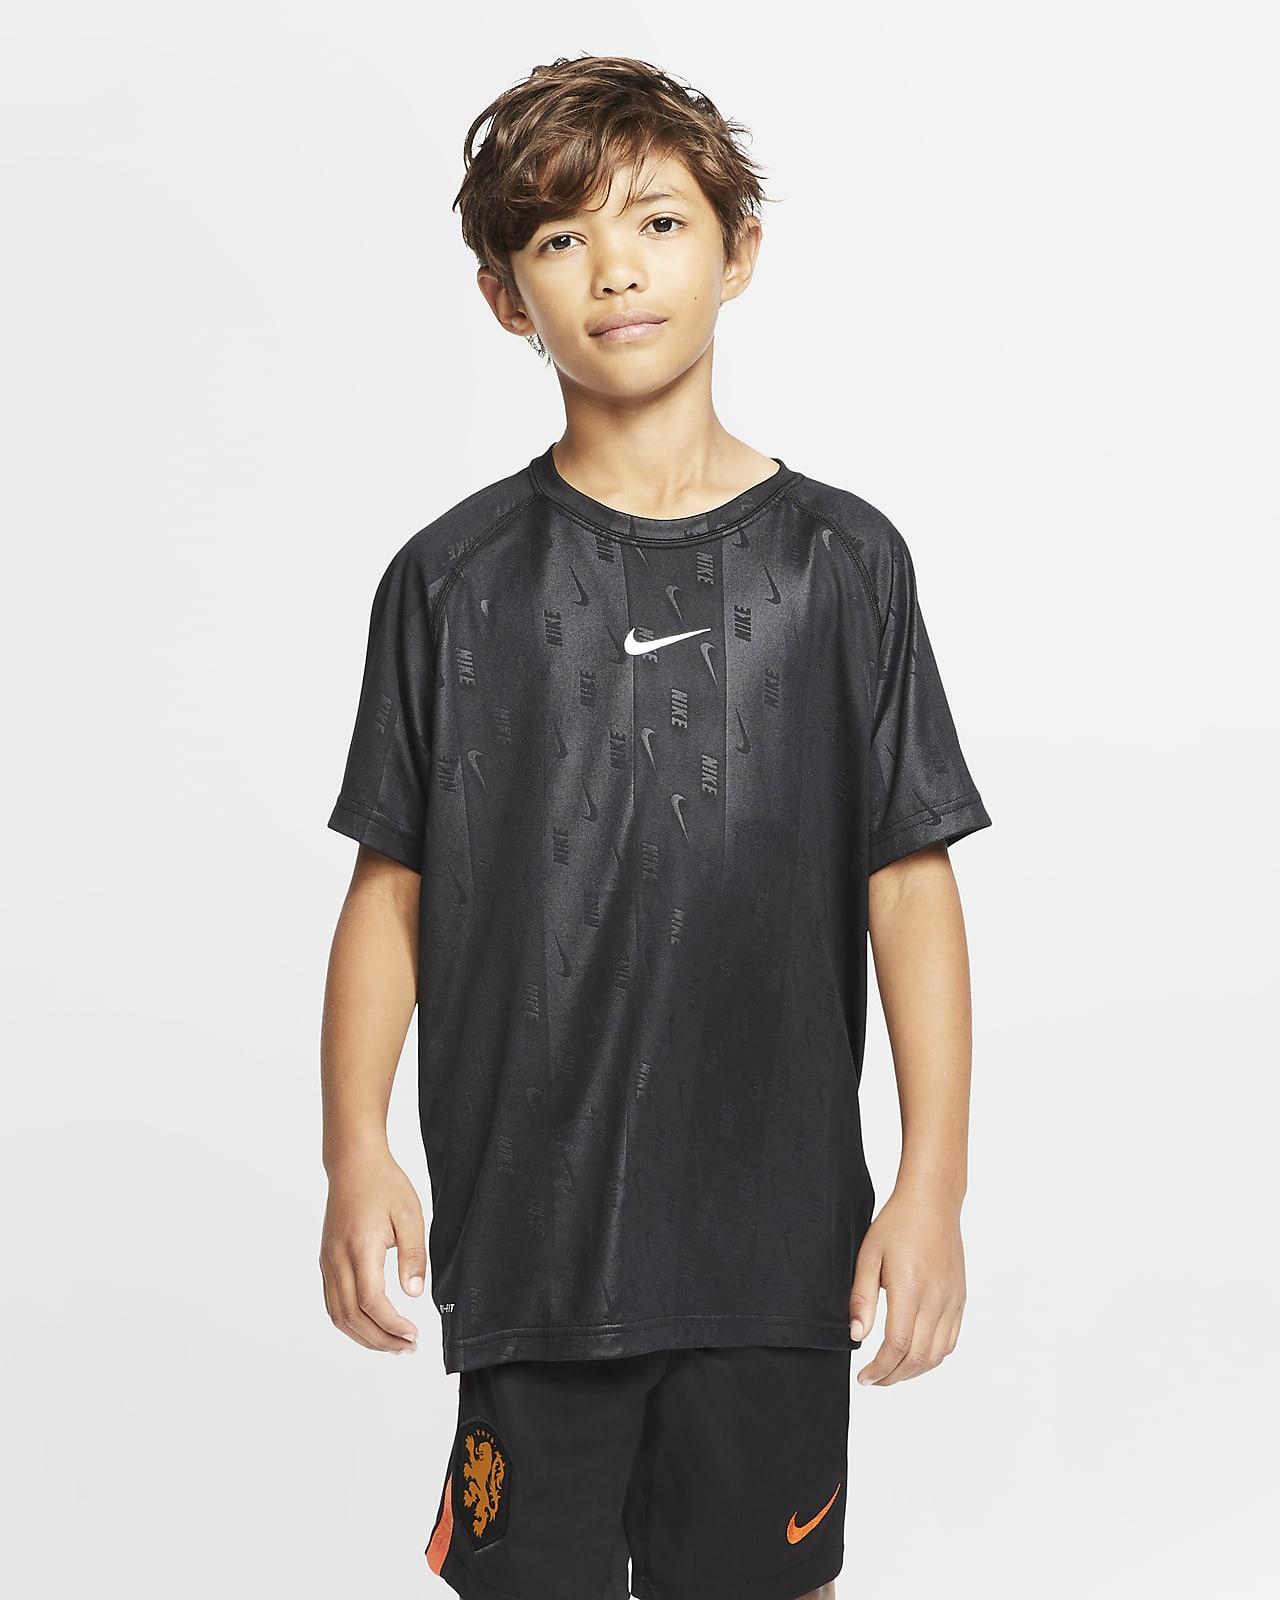 Nike Dri-FIT Older Kids' (Boys') Training T-Shirt